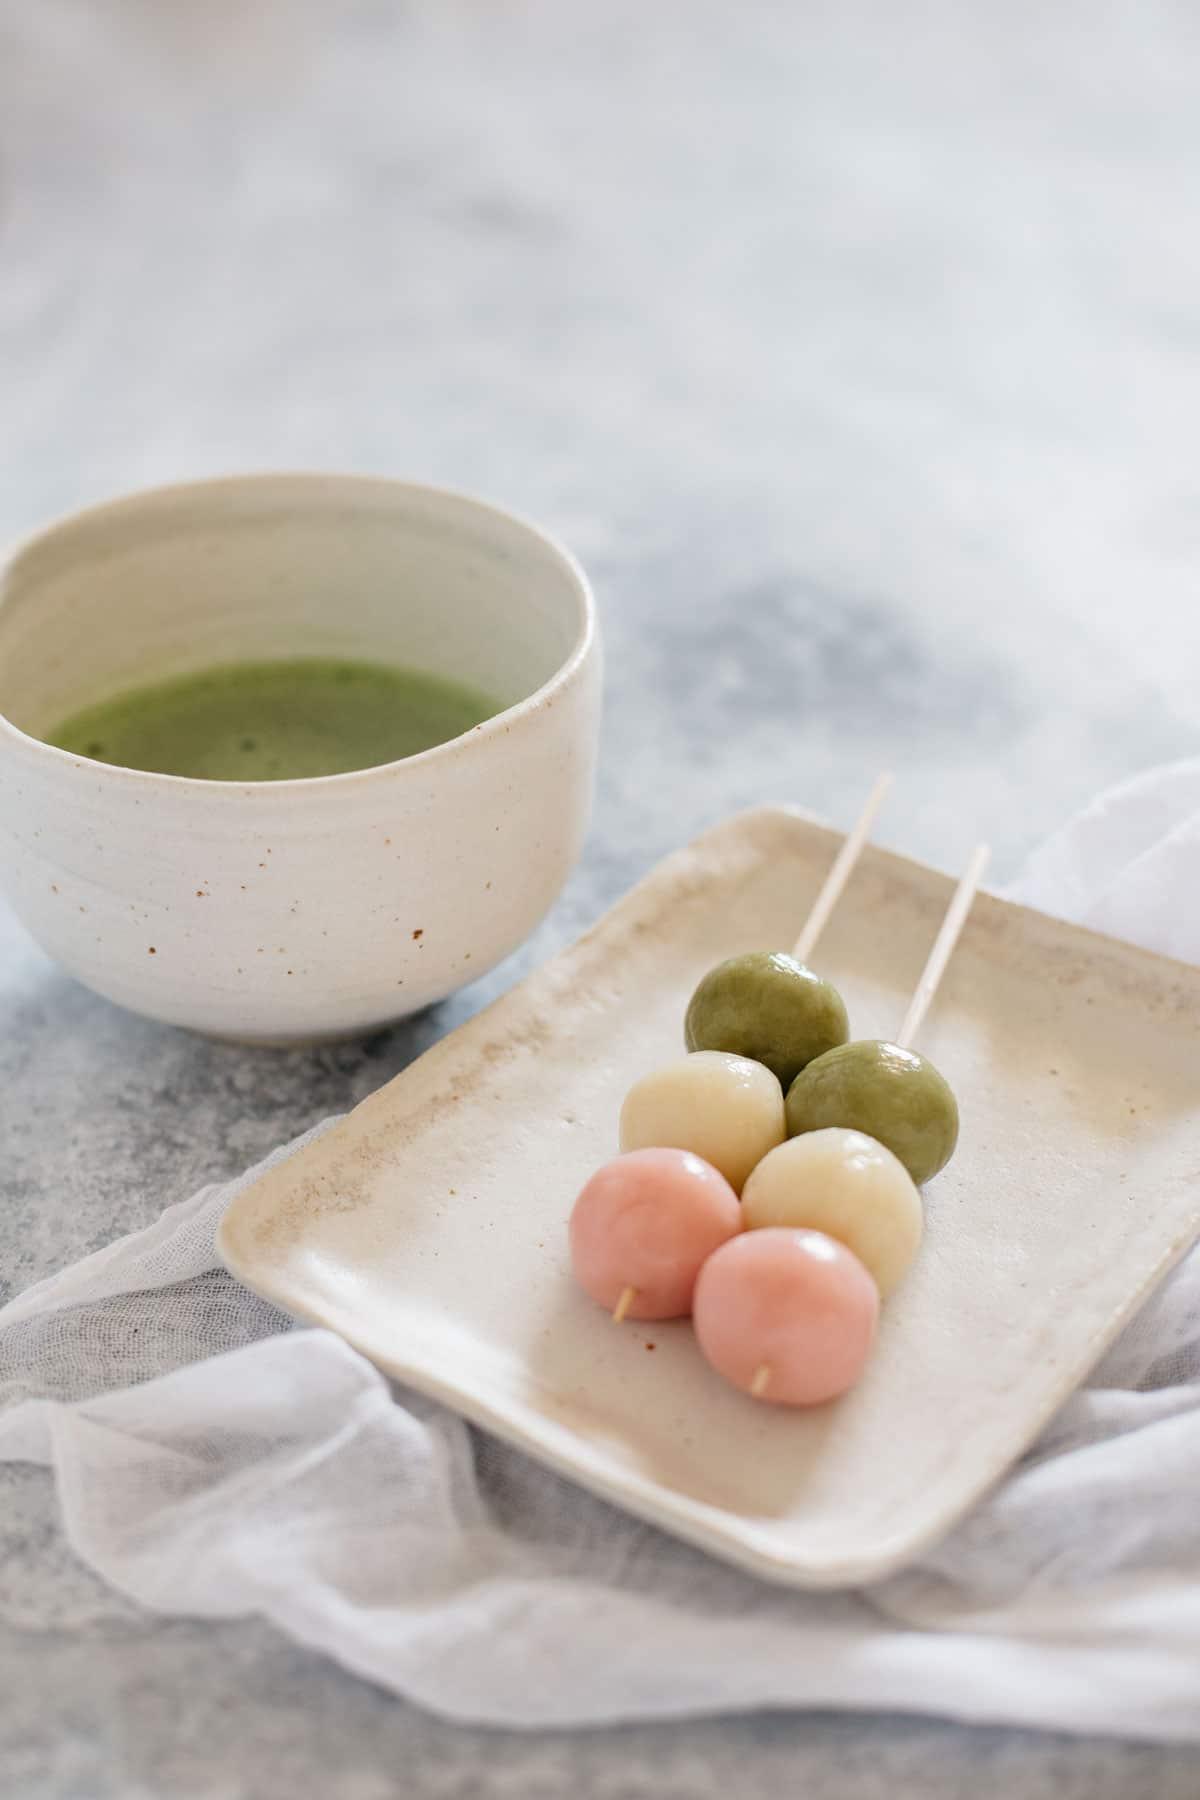 sanshoku dango served with matcha green tea